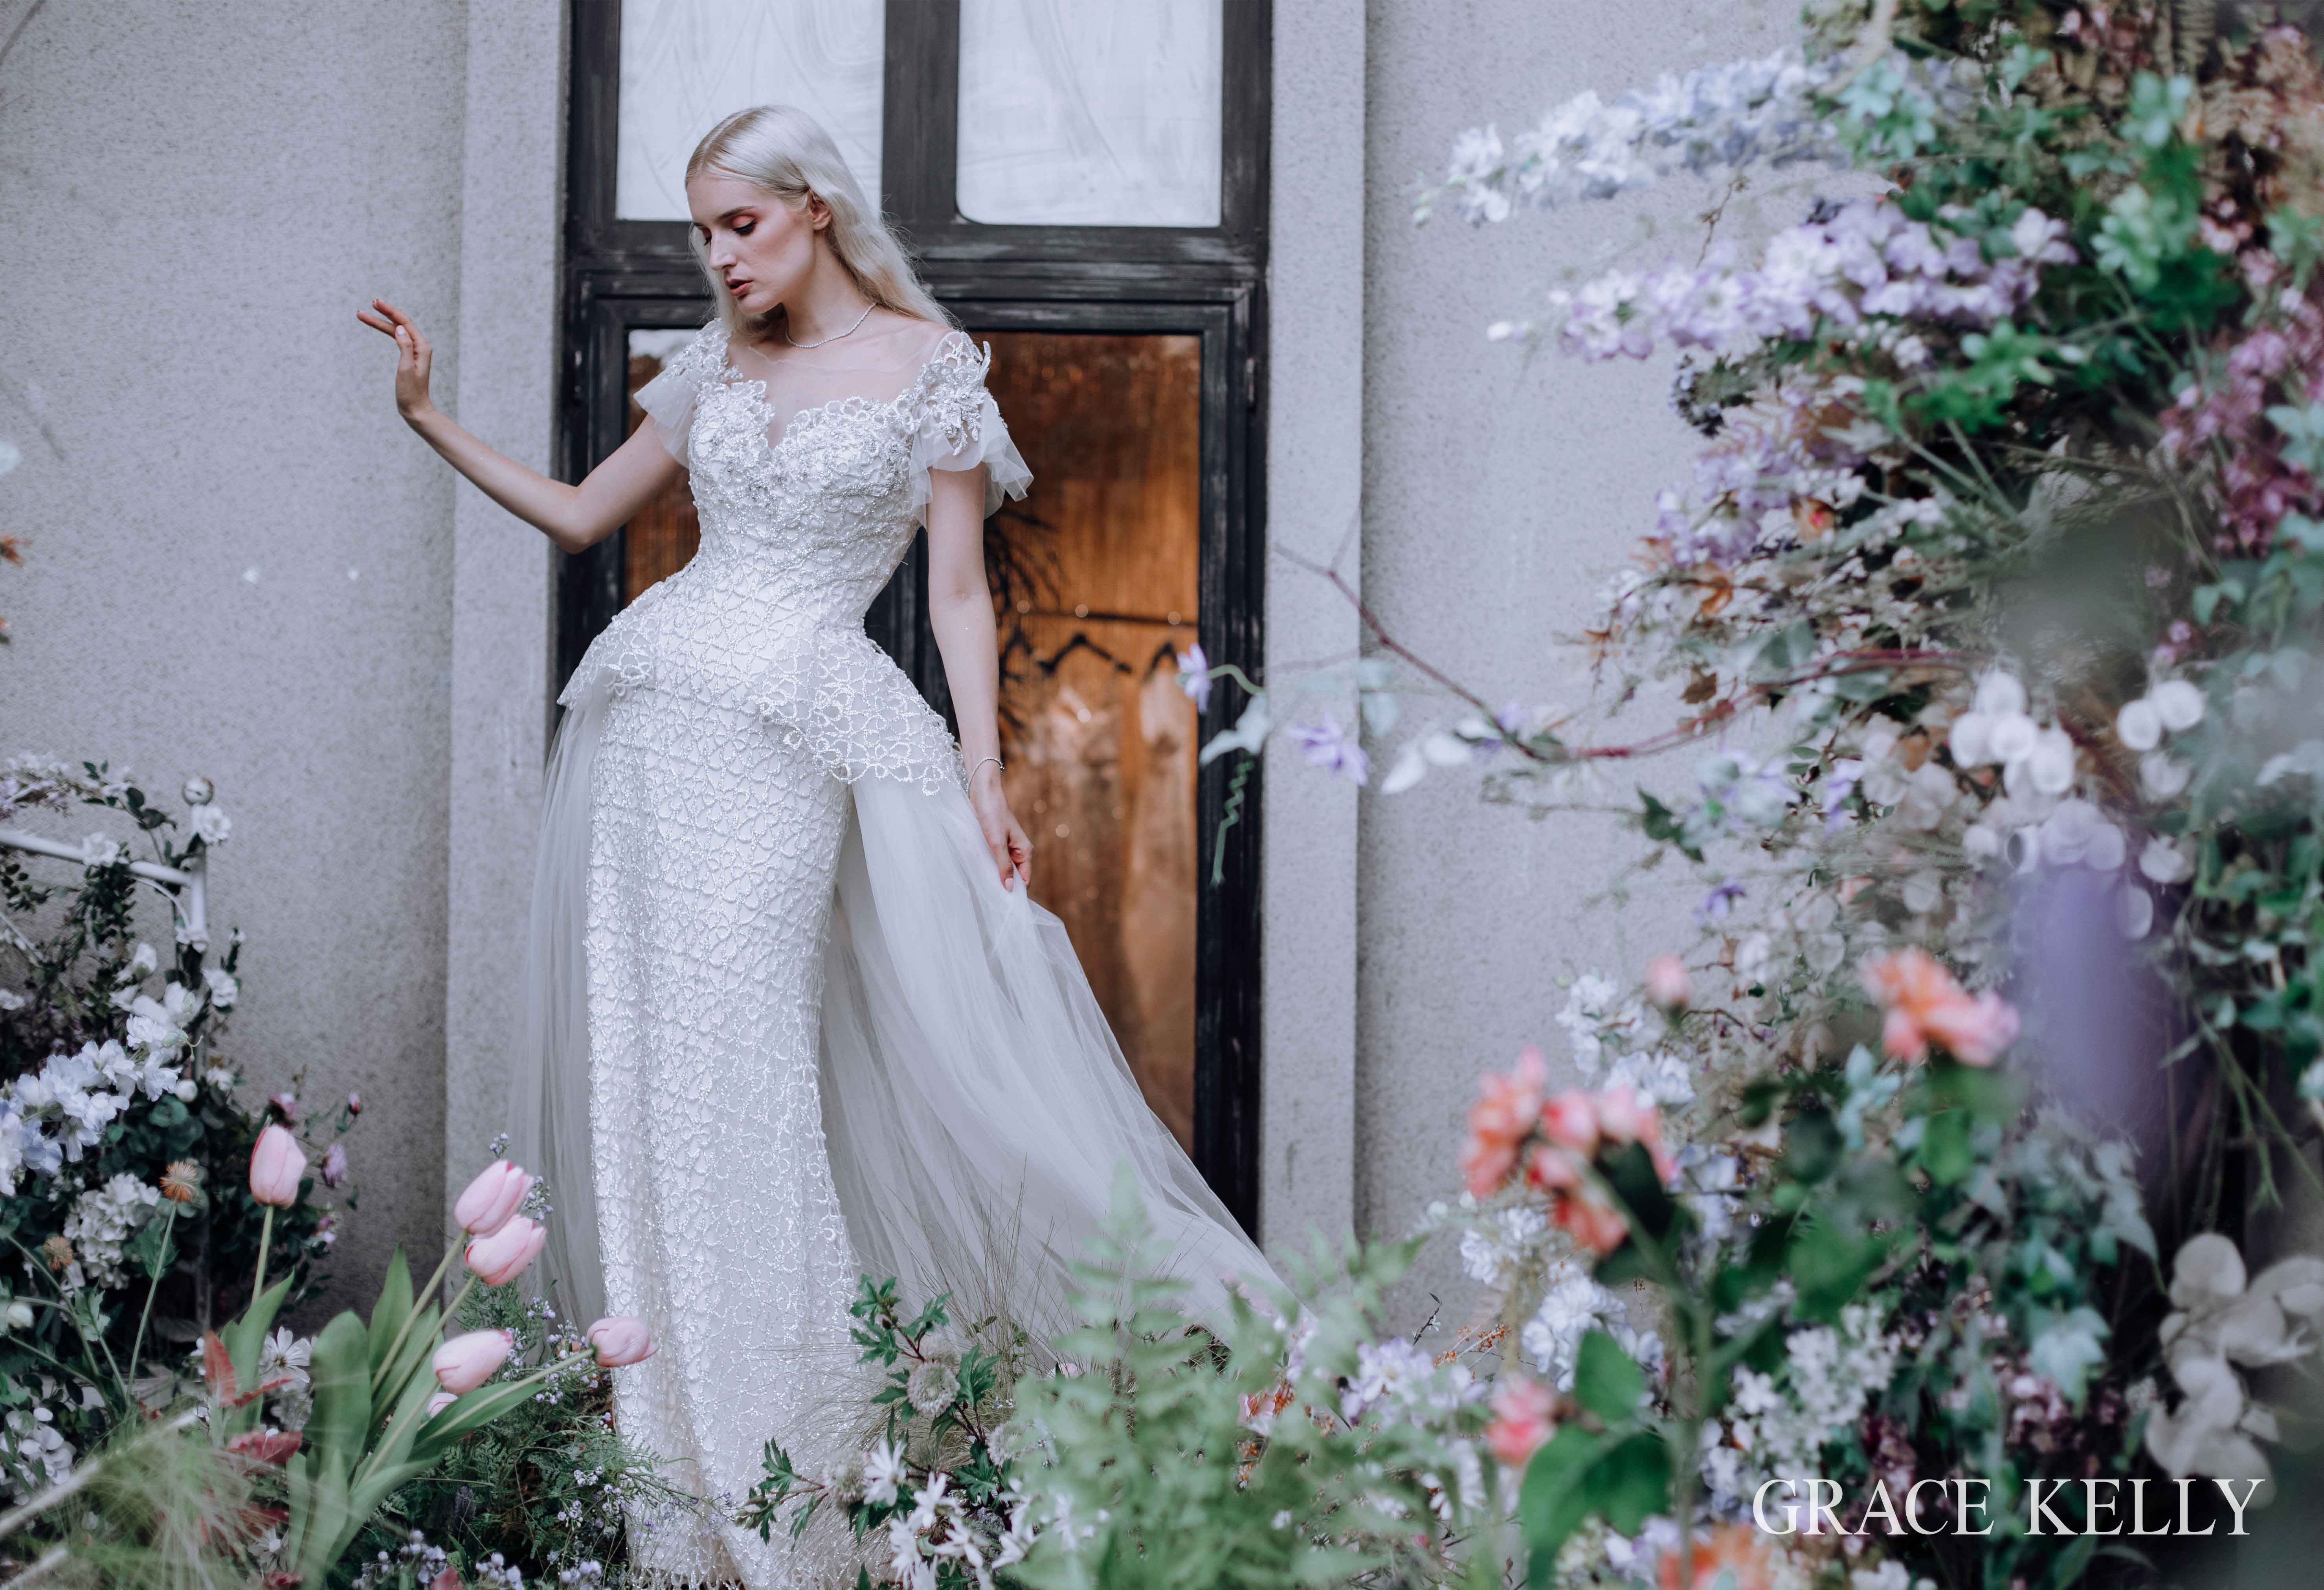 GRACE KELLY全新系列婚纱奢华亮相